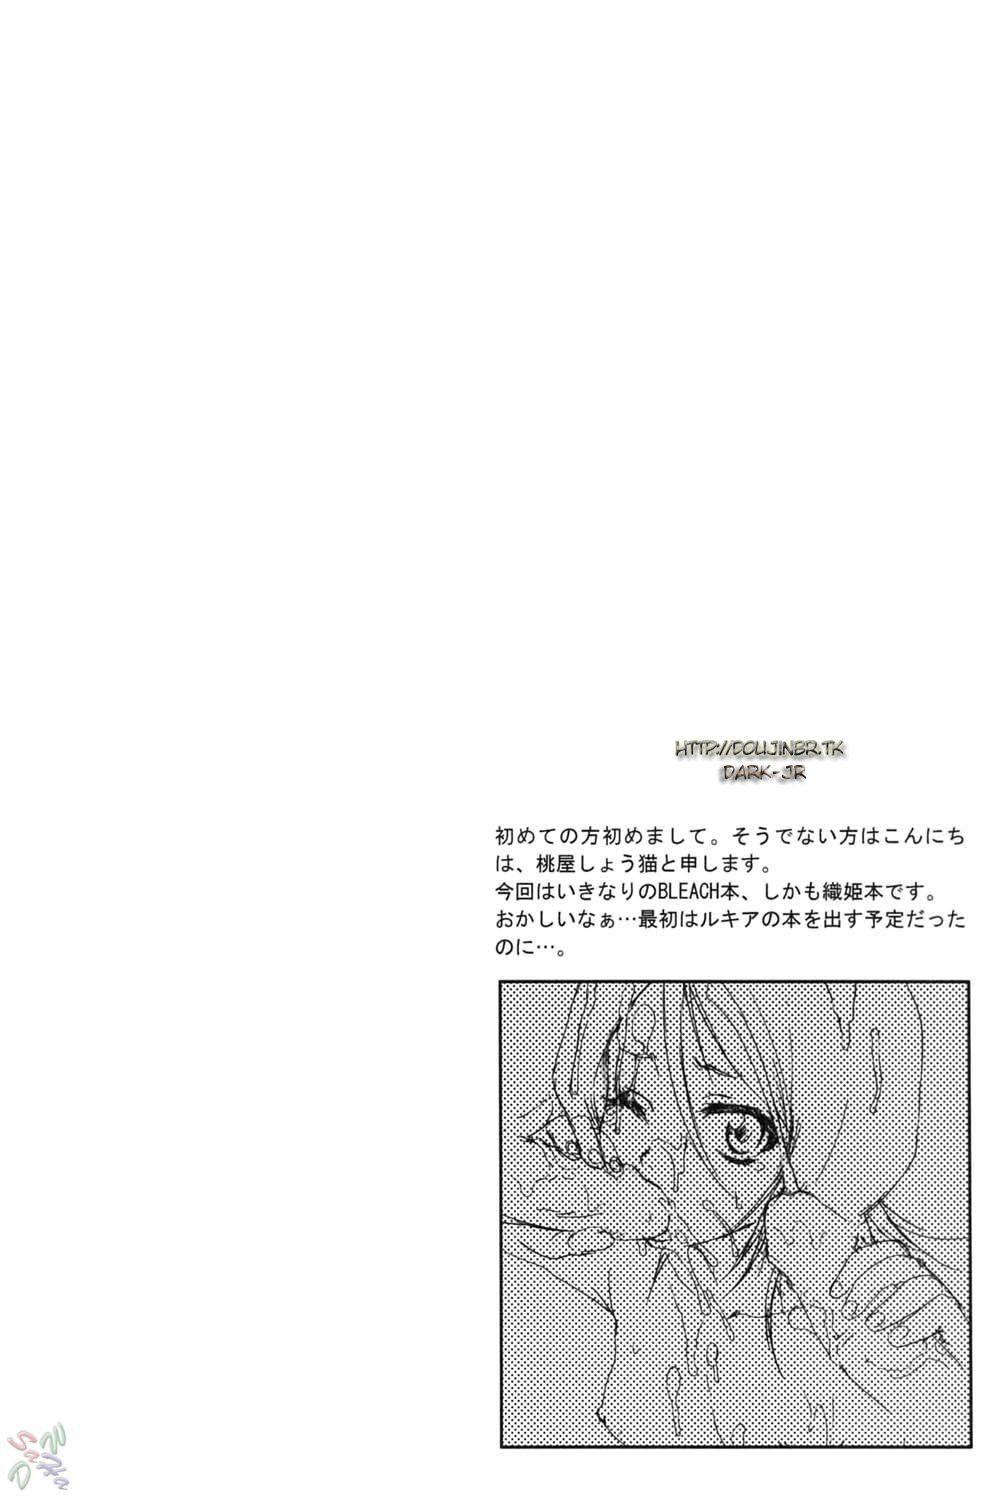 Hentaihome-Bleach-Orihime-chan-de-Go-3